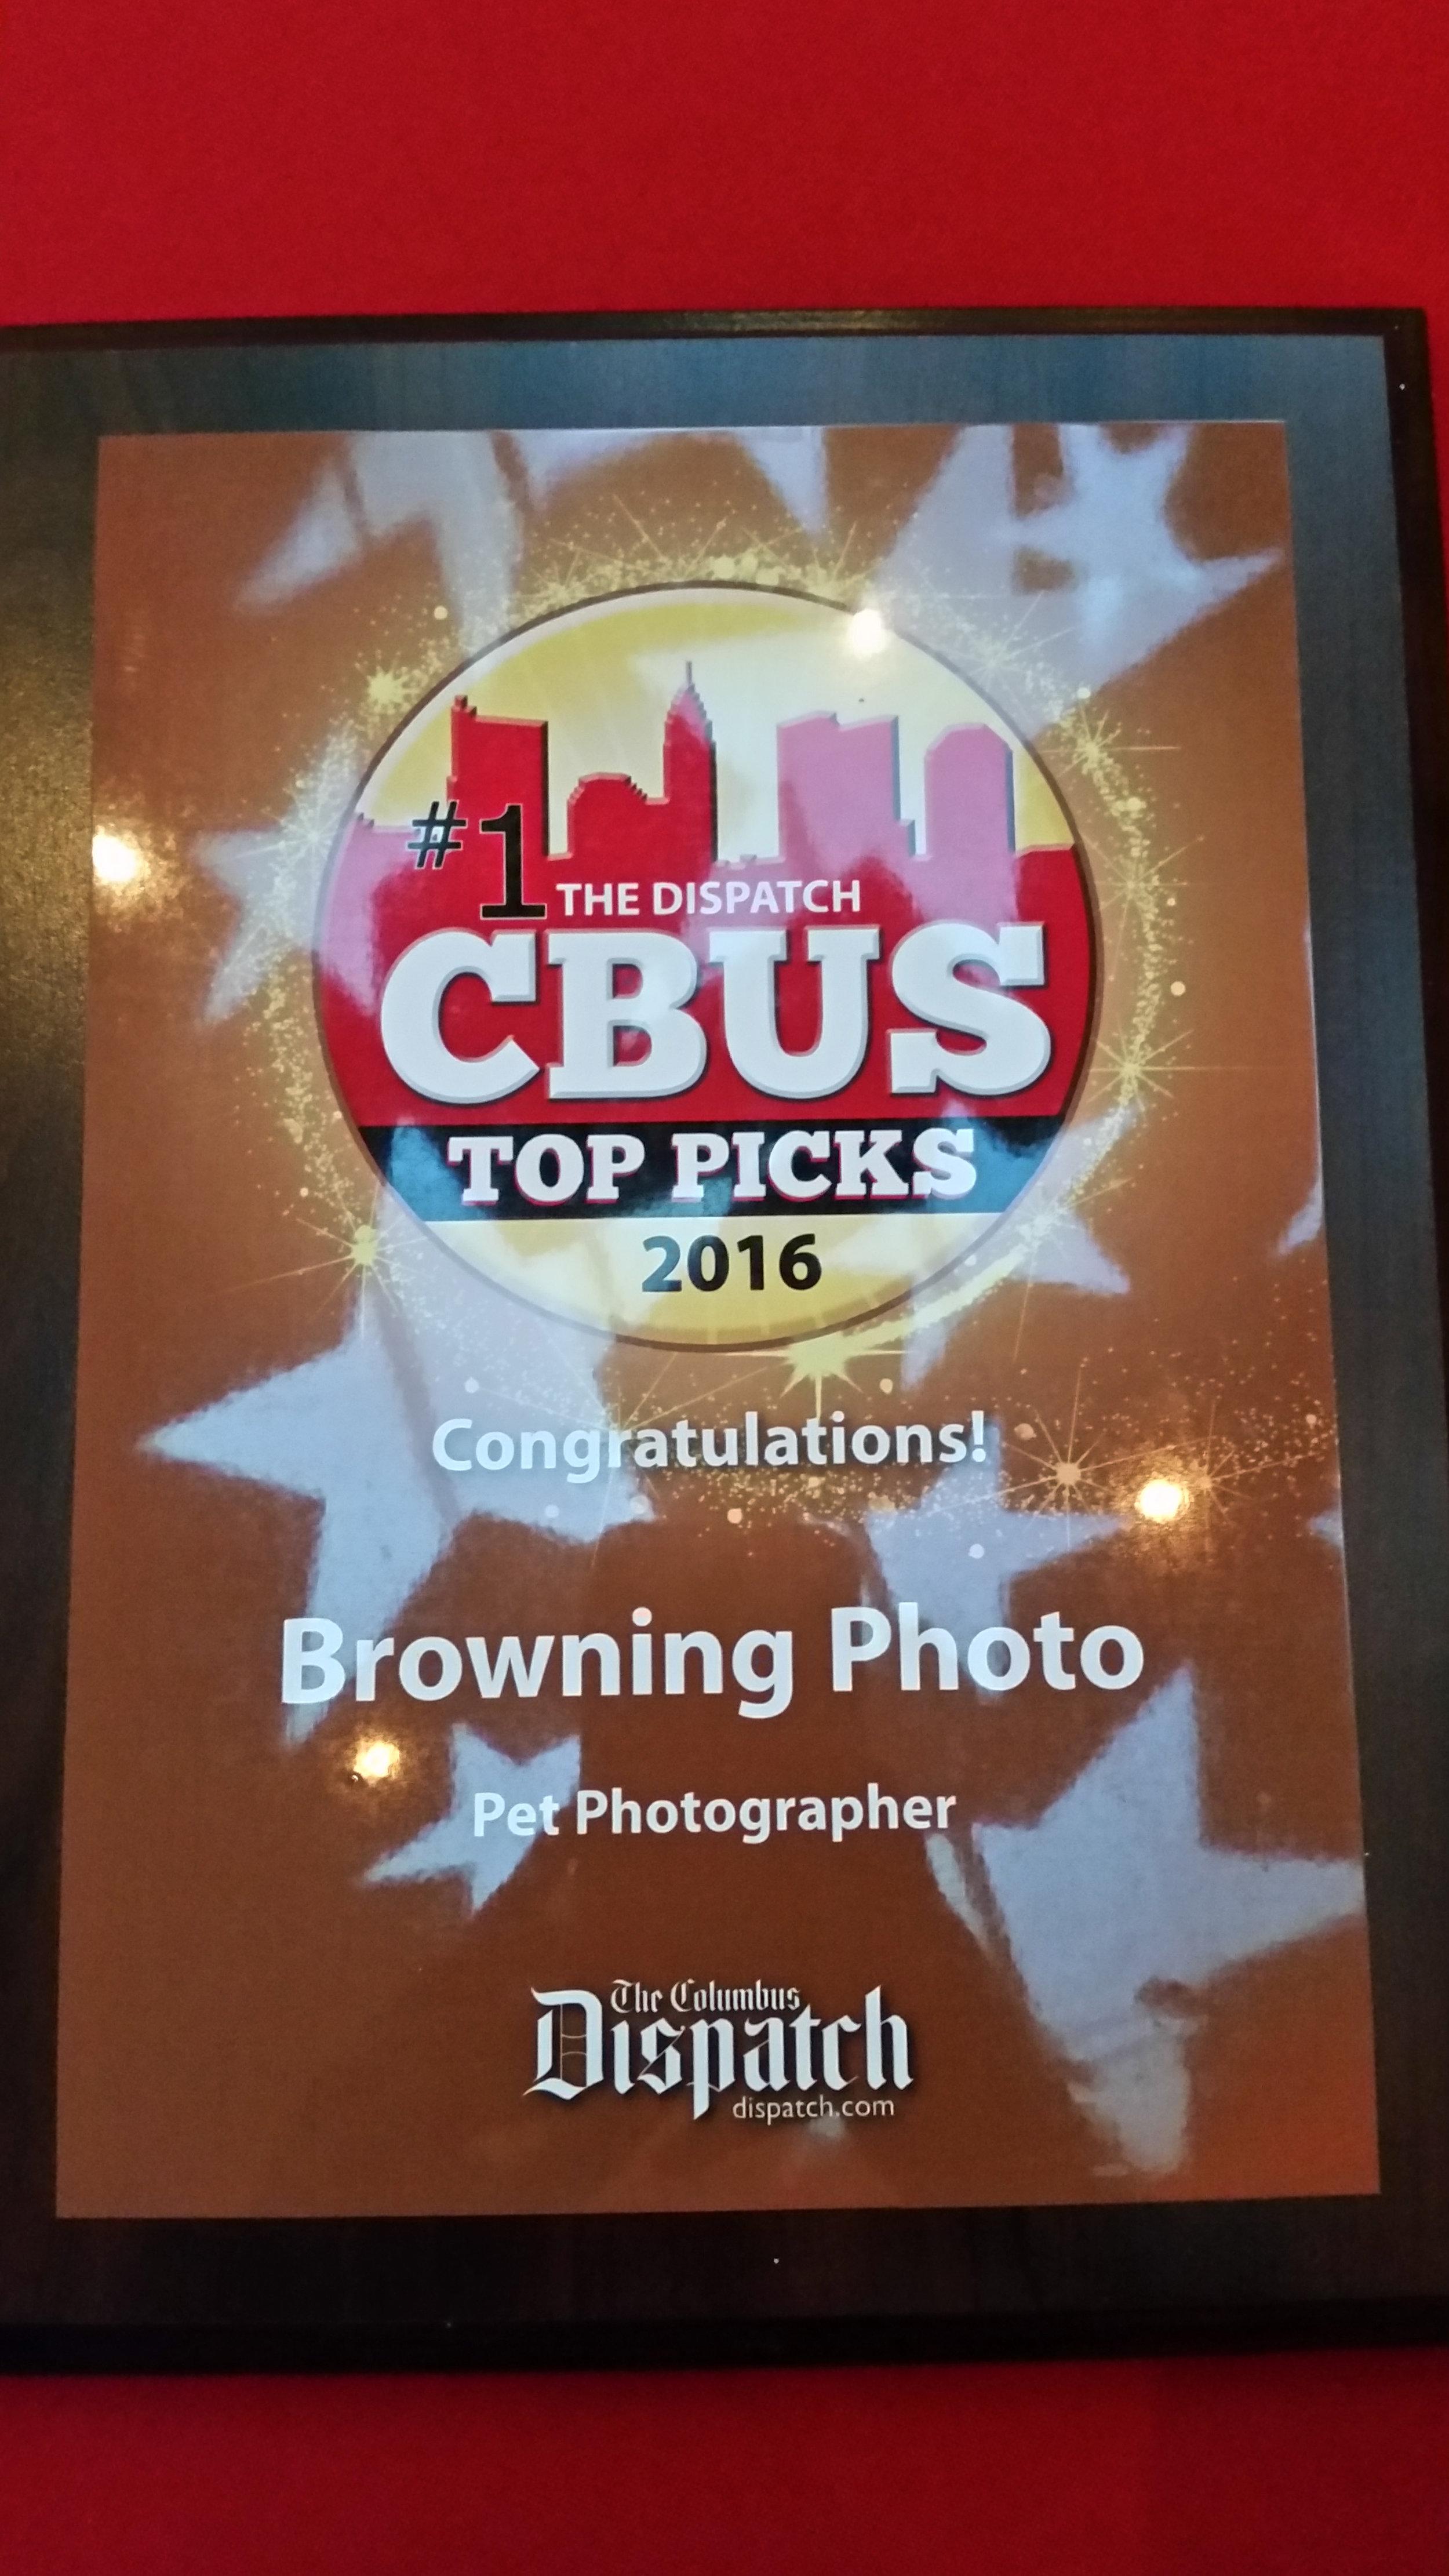 cbus-top-picks-3